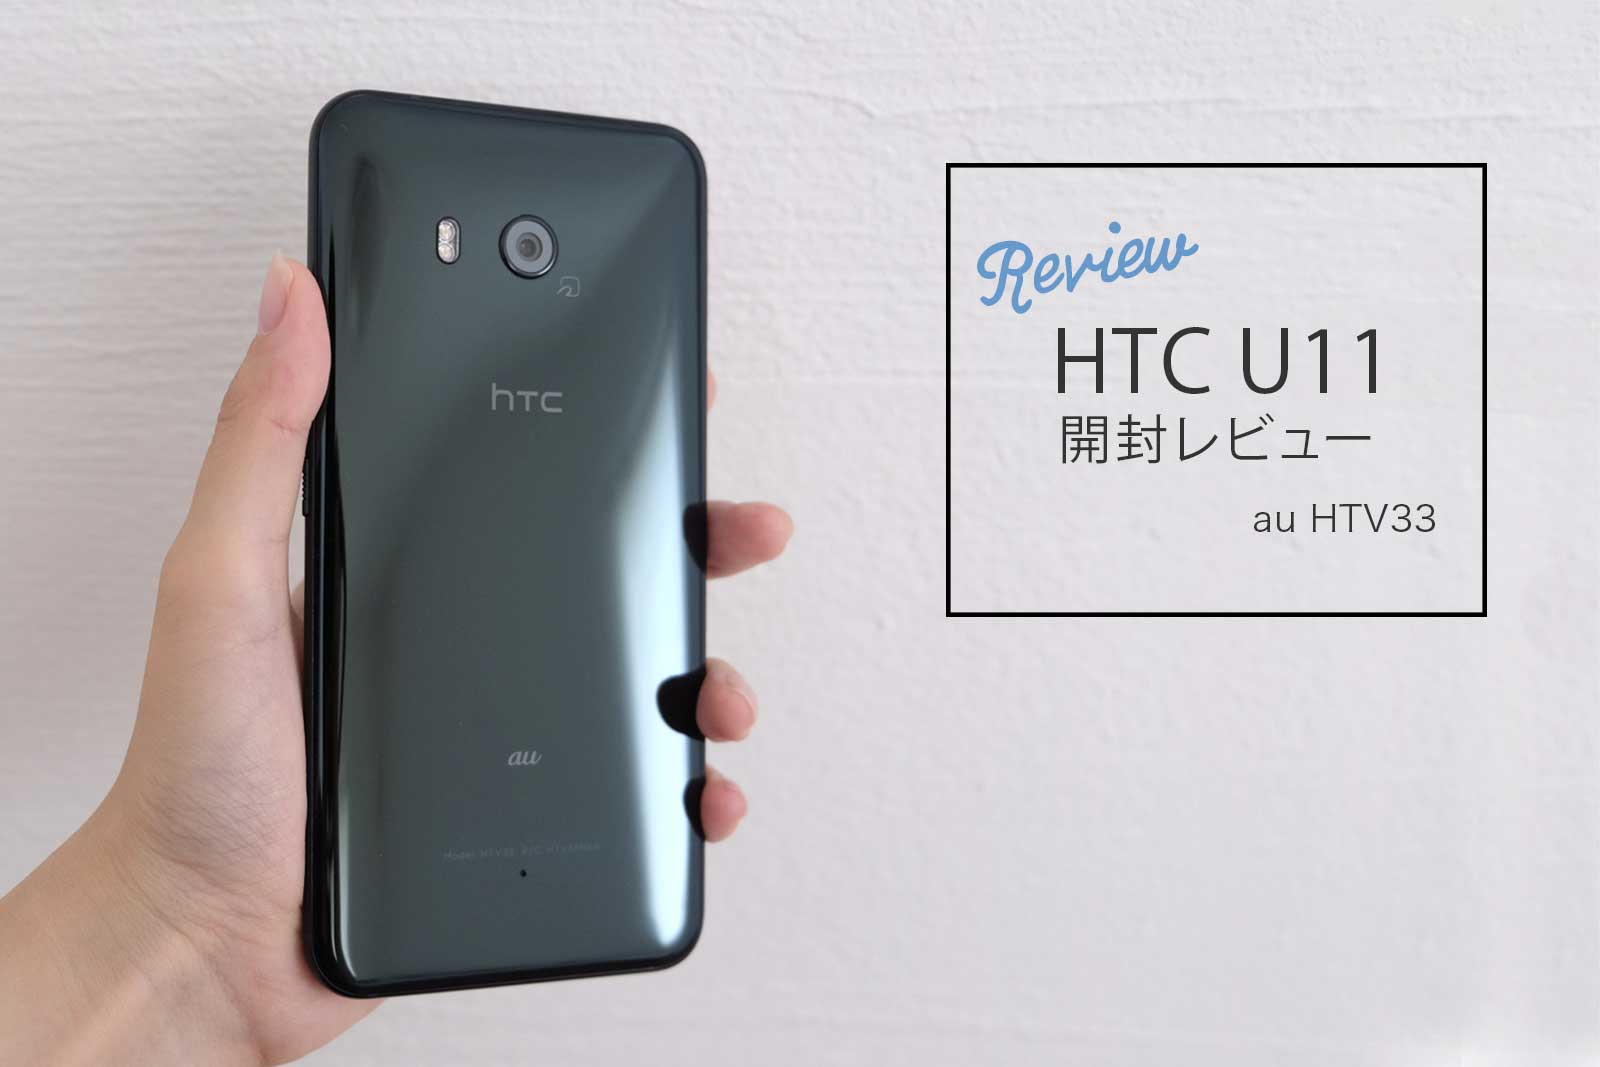 HTC U11 アイキャッチ画像